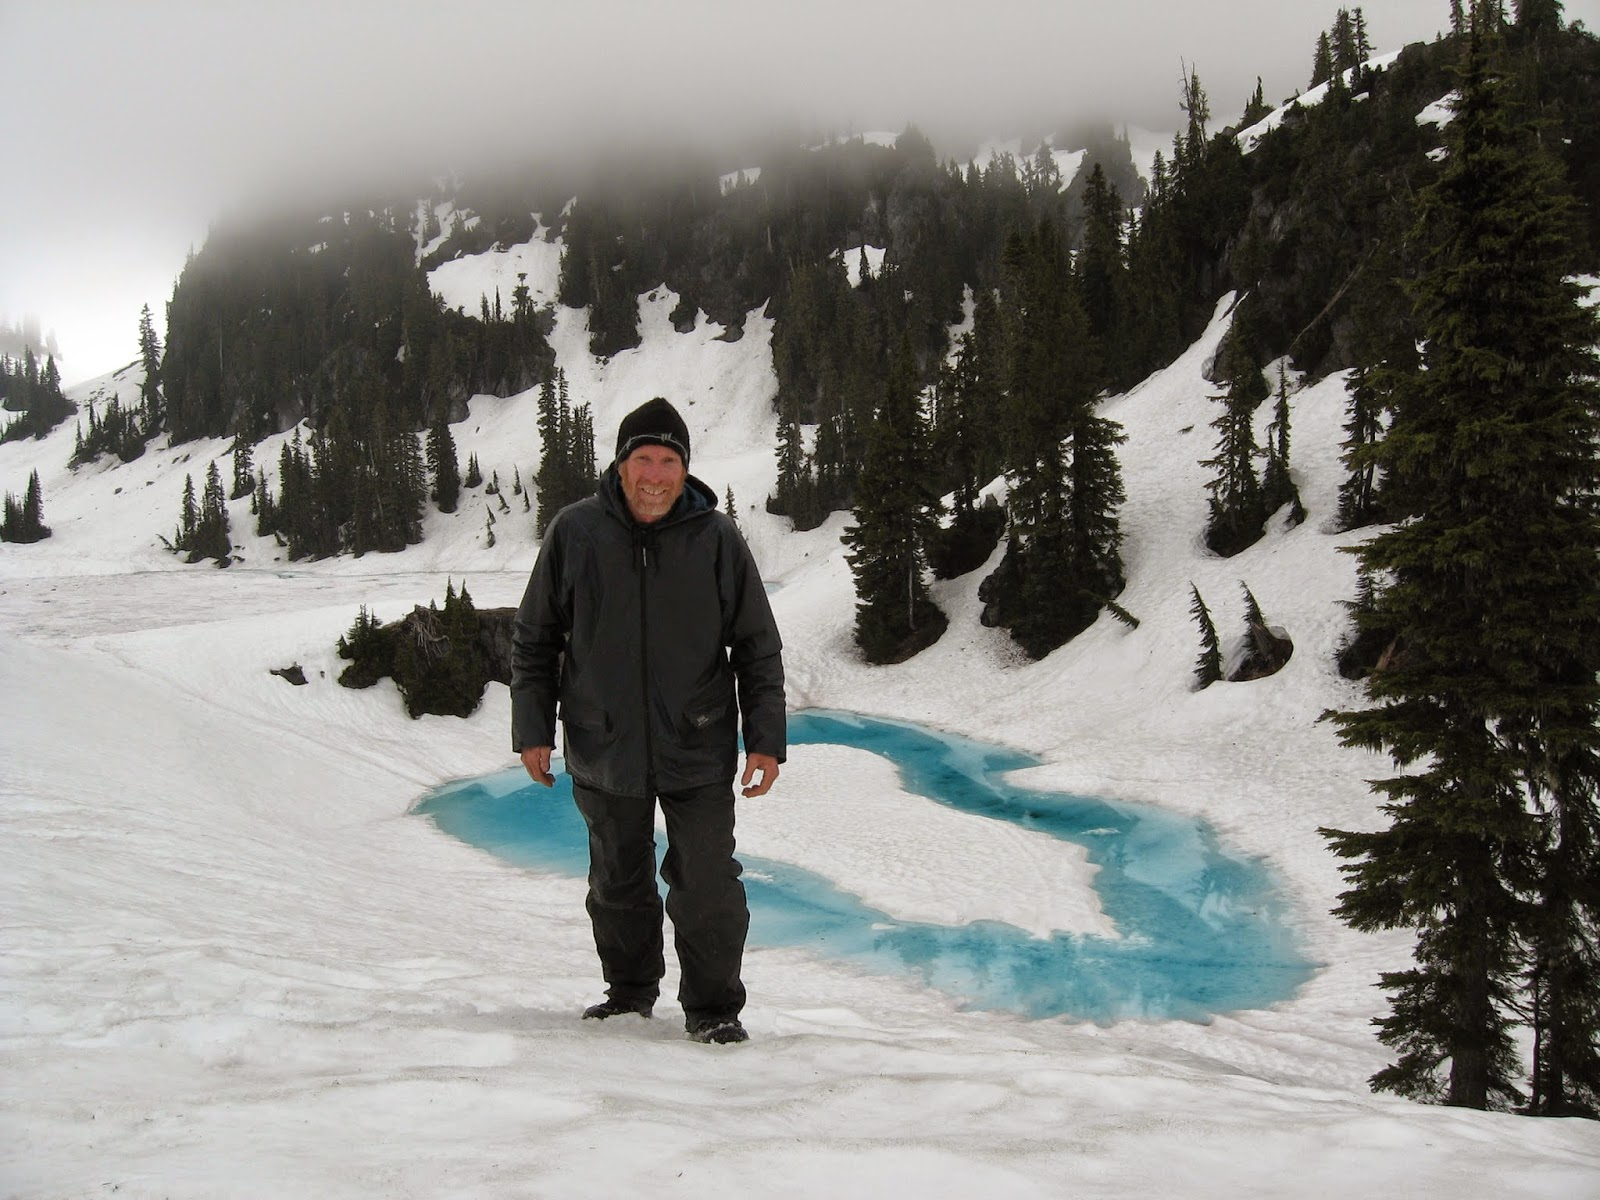 [IMG]http://4.bp.blogspot.com/-jTE9o3zwrJI/U3FuEUhwGpI/AAAAAAAAAR8/jh-gYWSDPh8/s1600/July+snow+walker.JPG[/IMG]